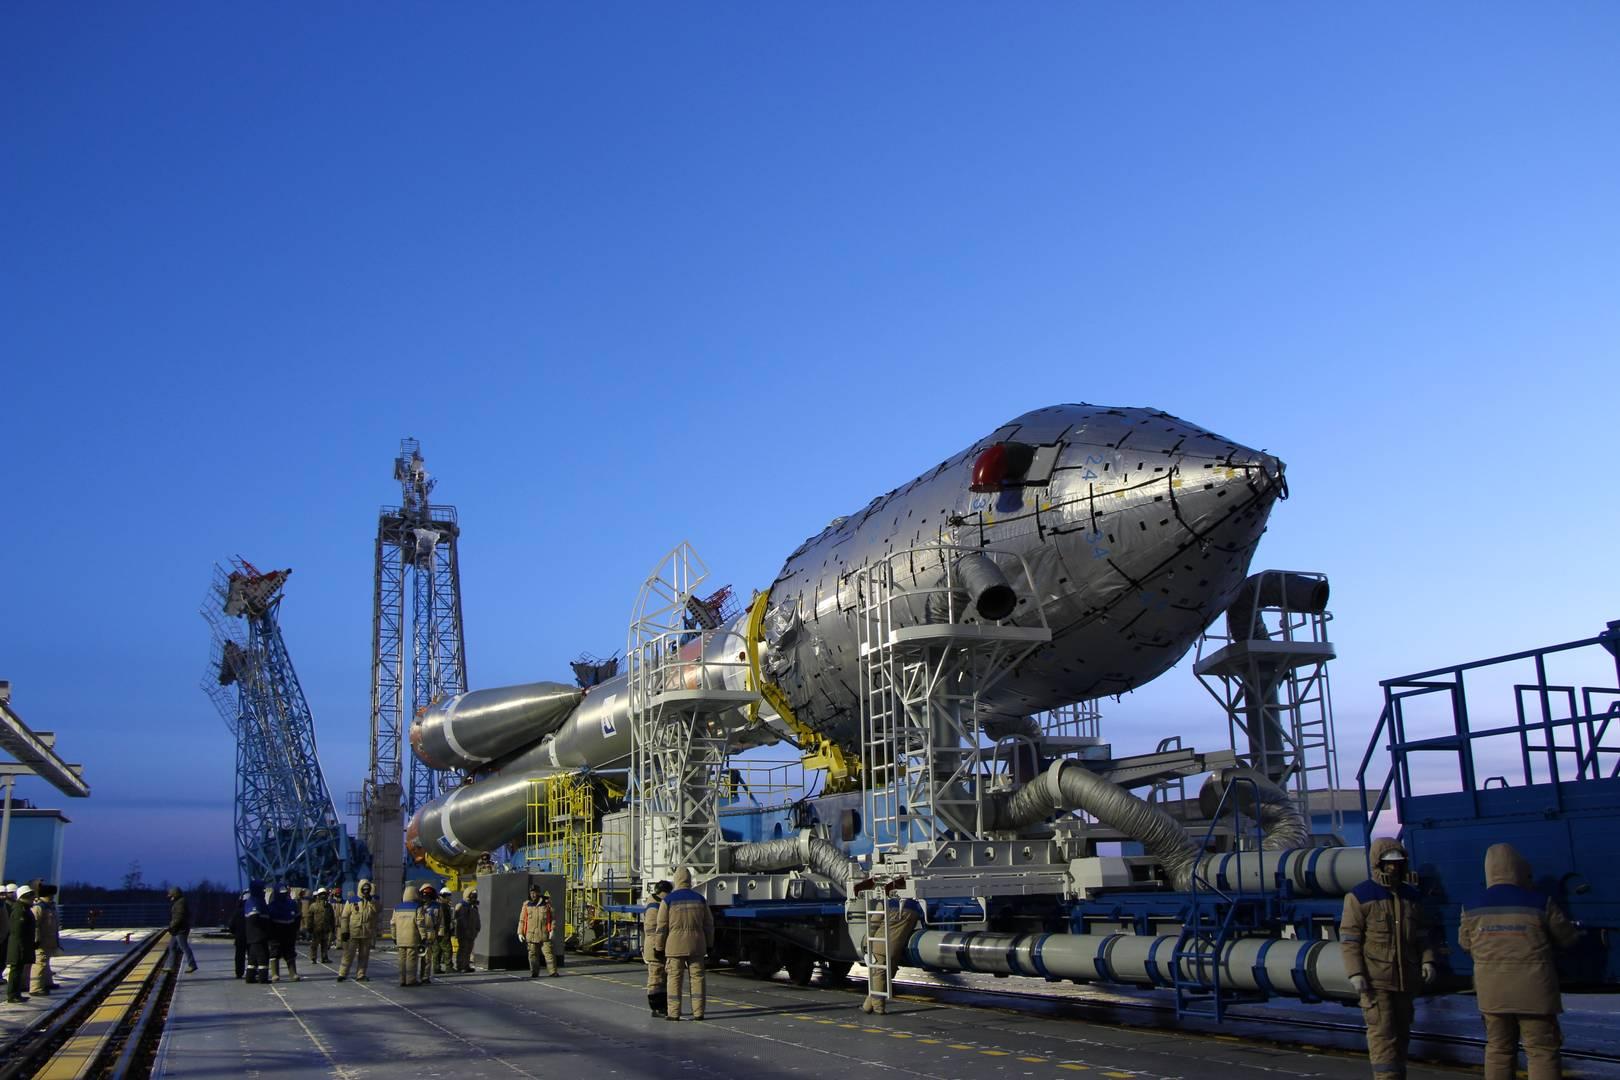 Модернизированная система телеметрических измерений РТСЦМ-1 на ракете-носителе «Союз-2»